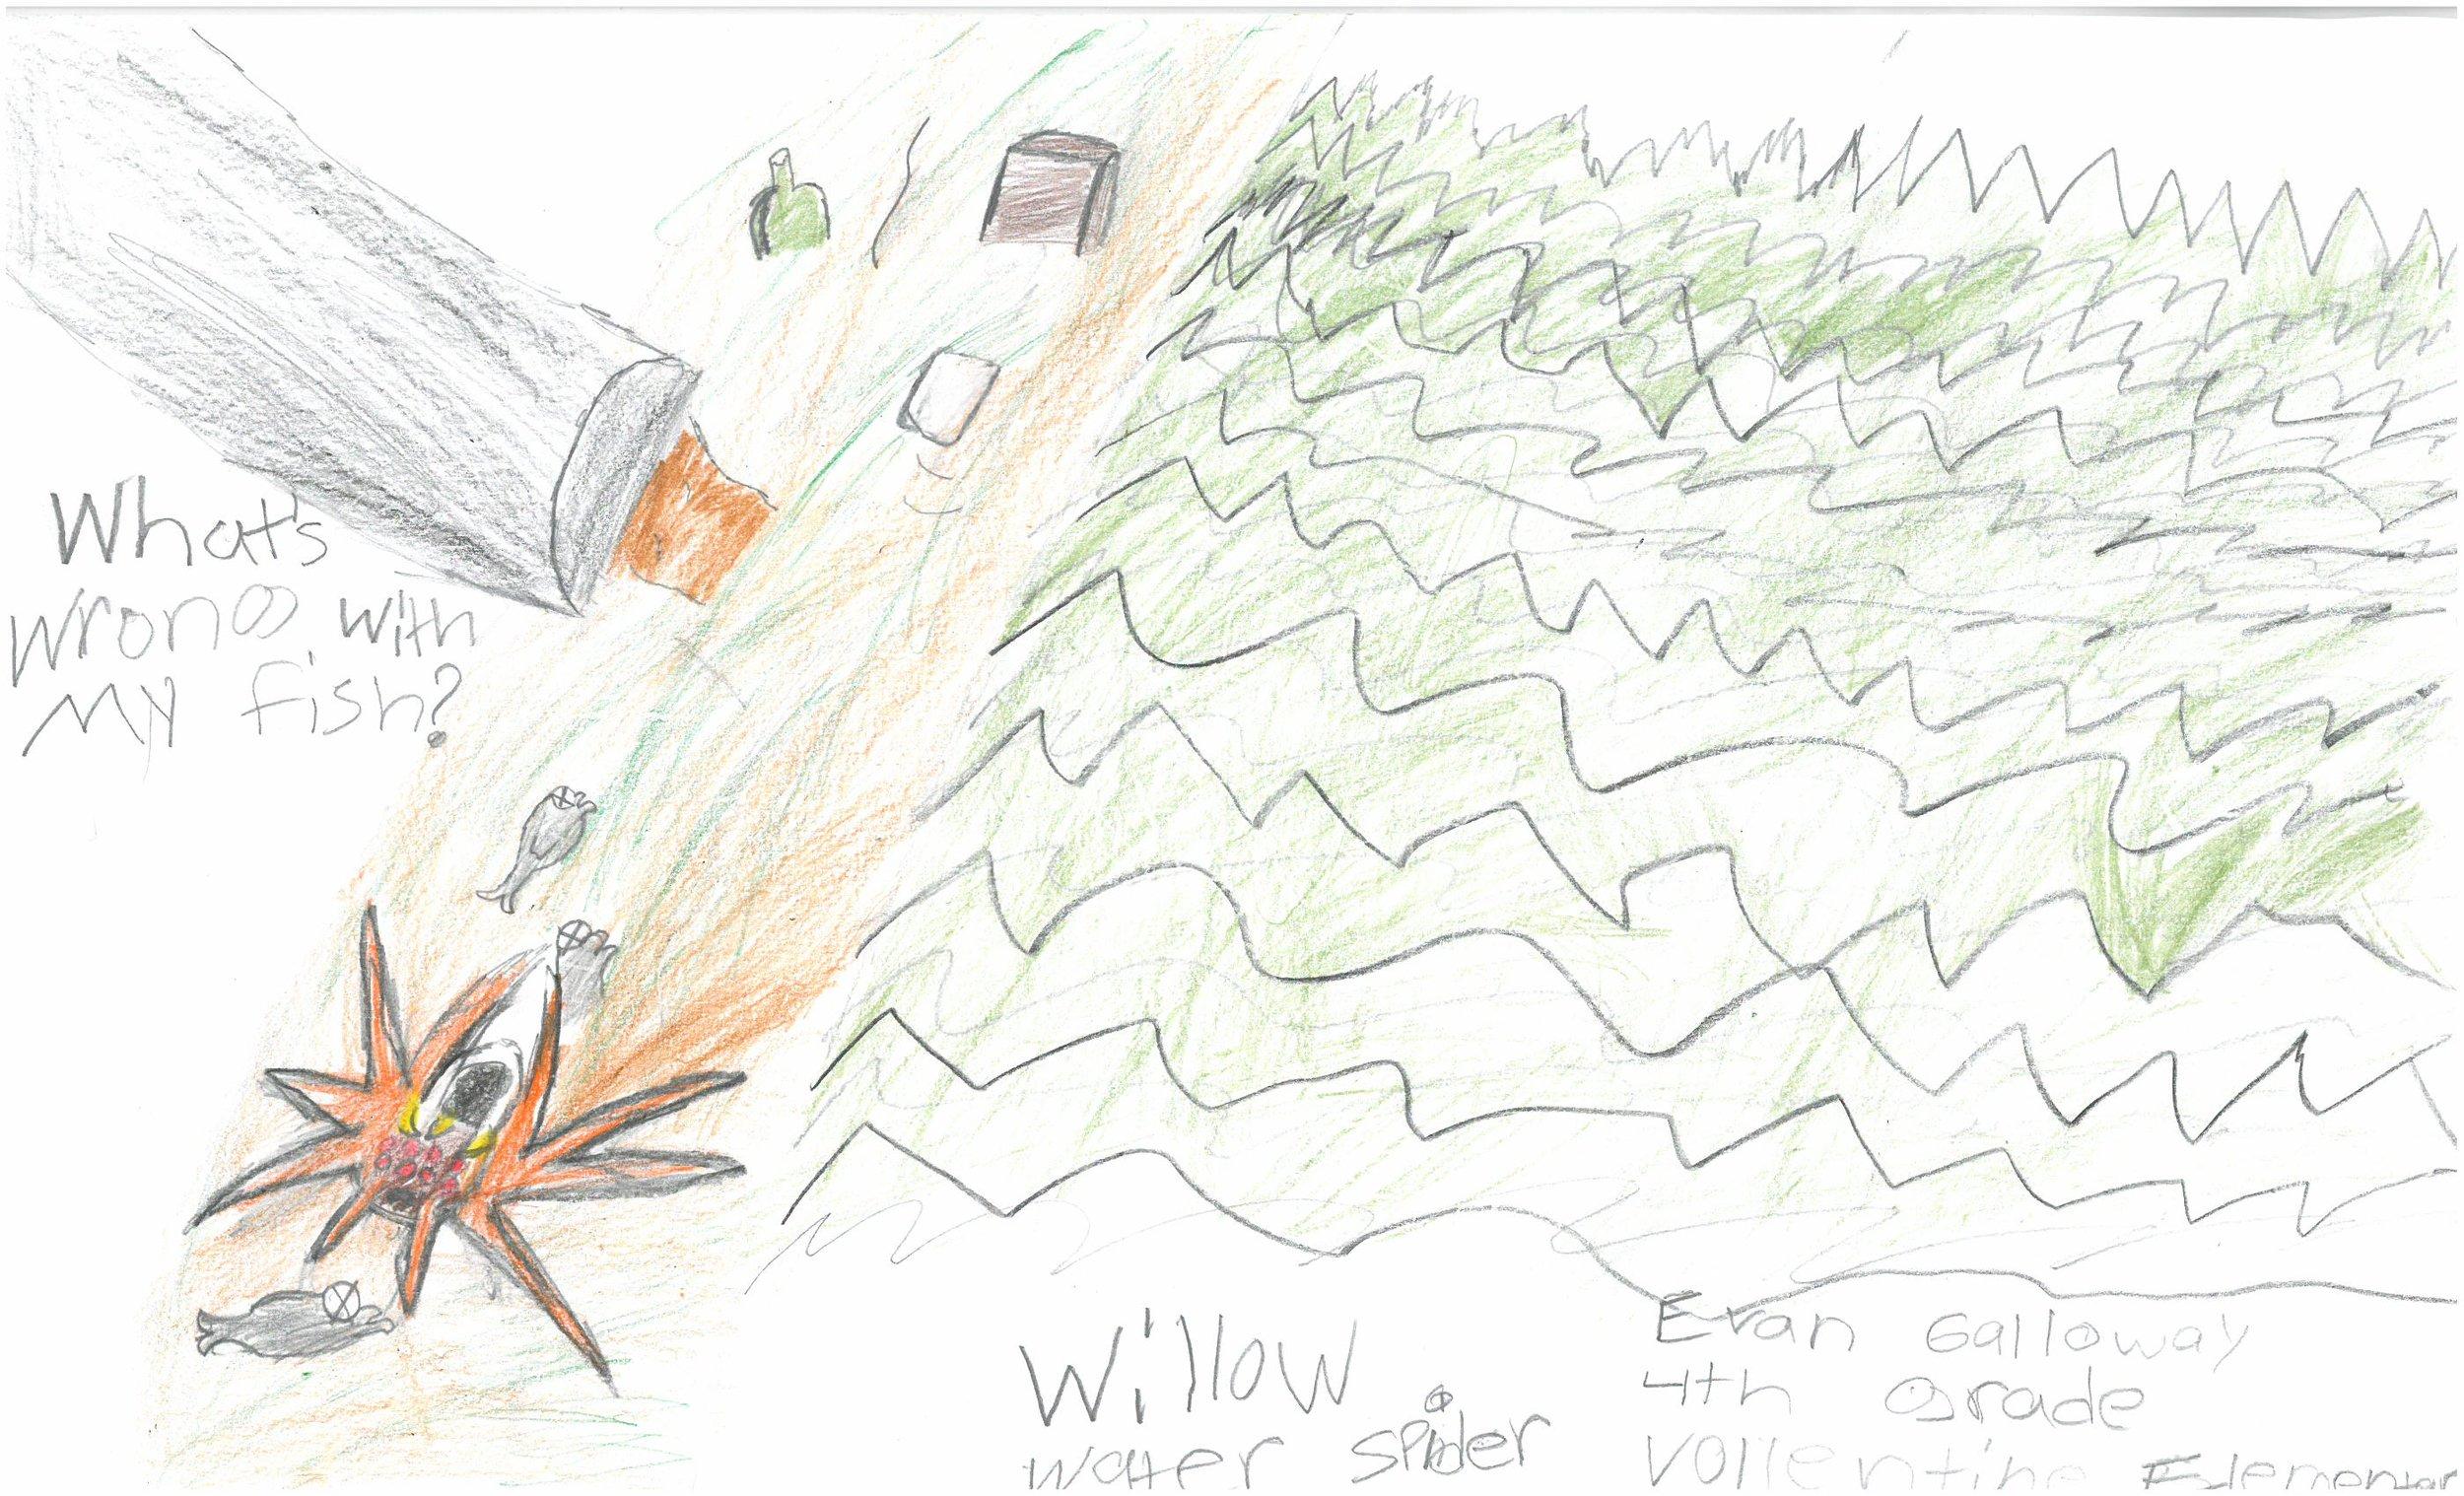 Evan Galloway, 4th grader at Vollentine Elem.